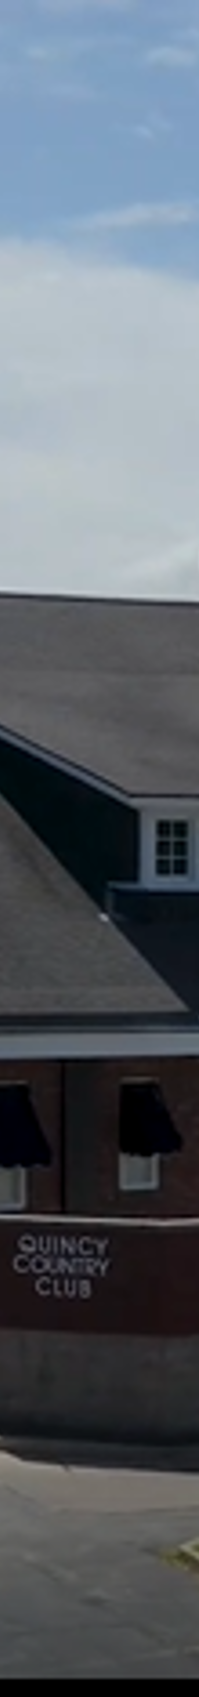 HOUSE RULES BORDER